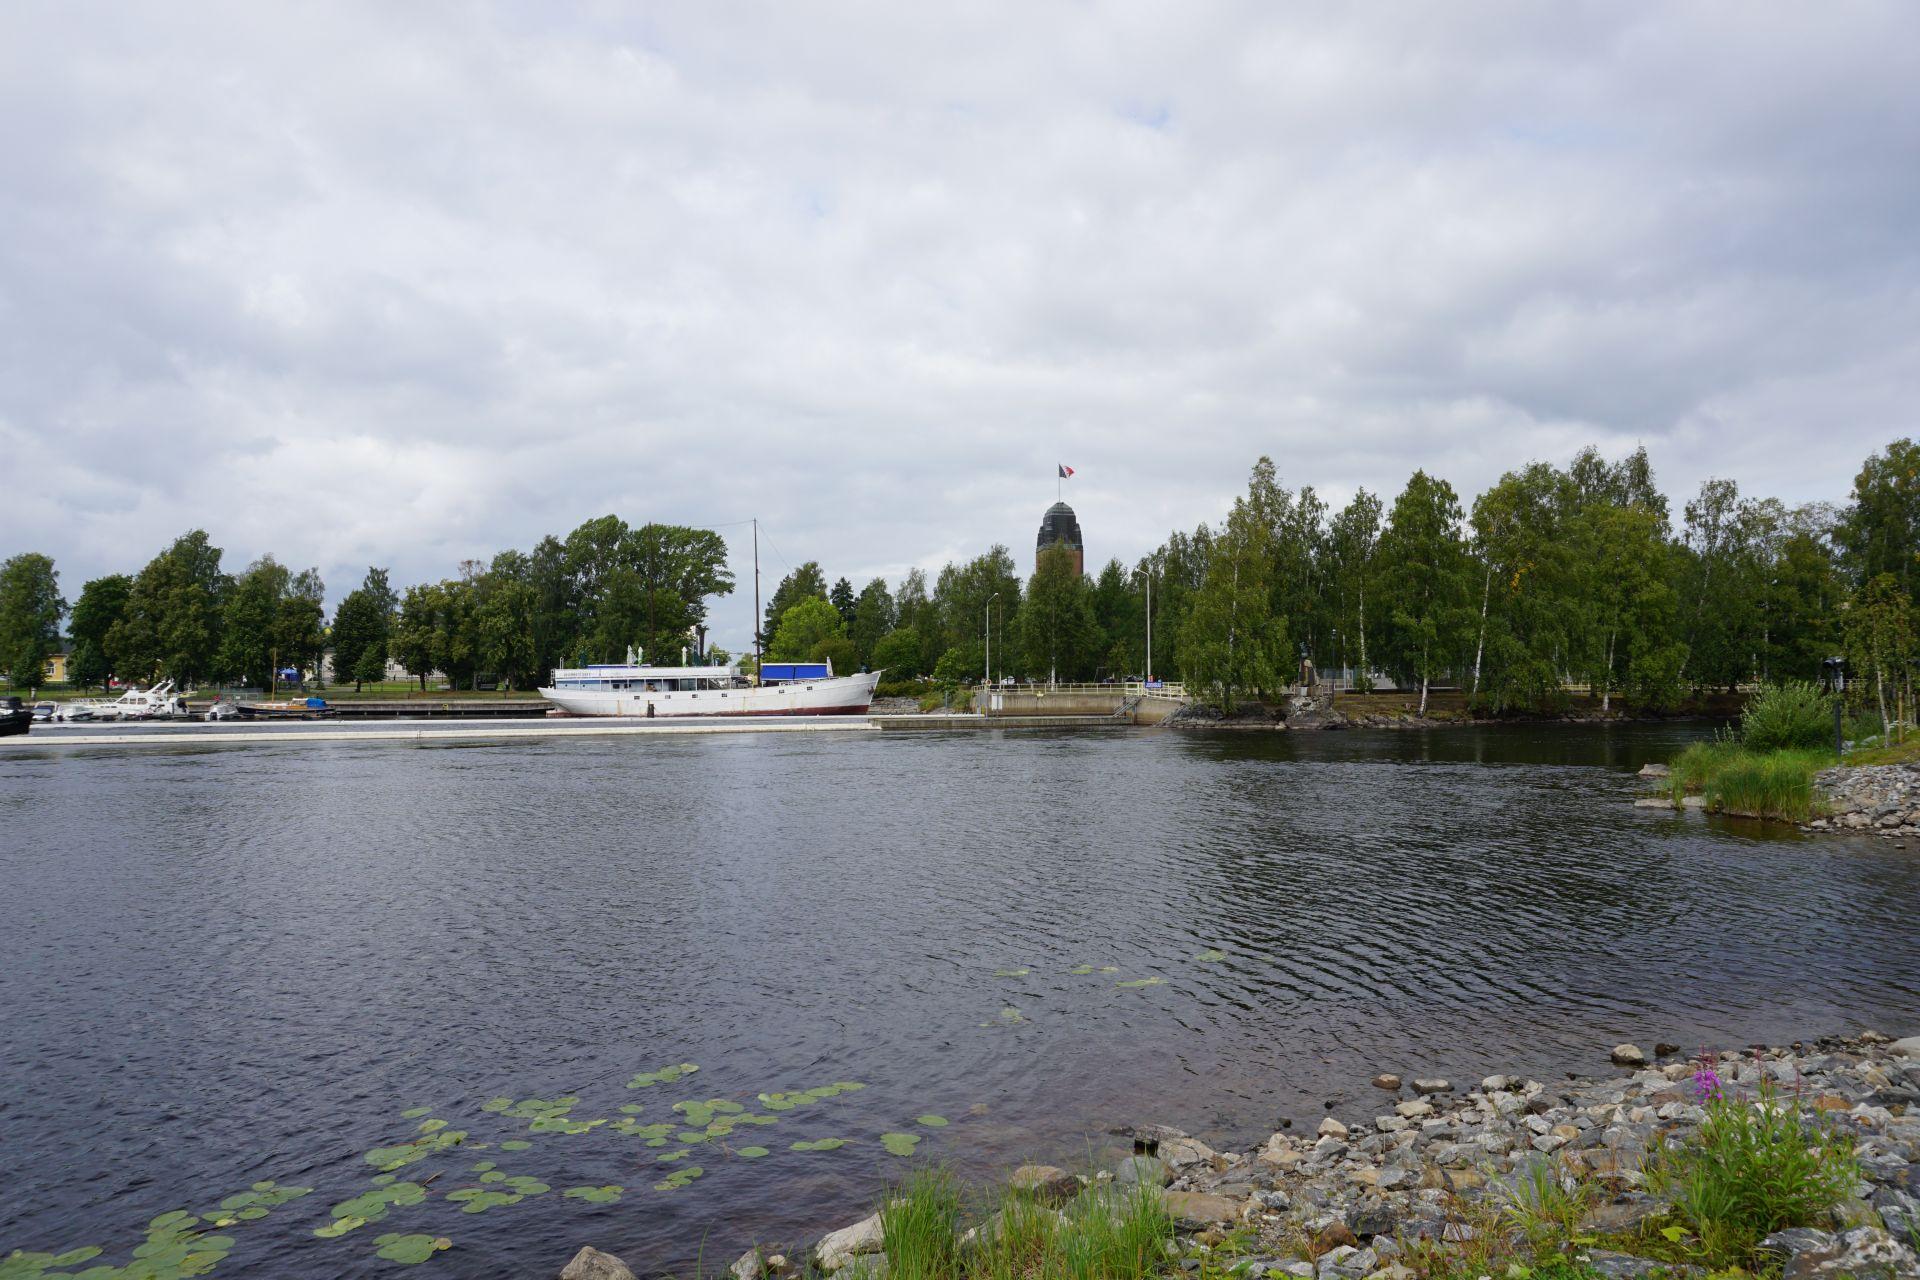 Visiting Joensuu